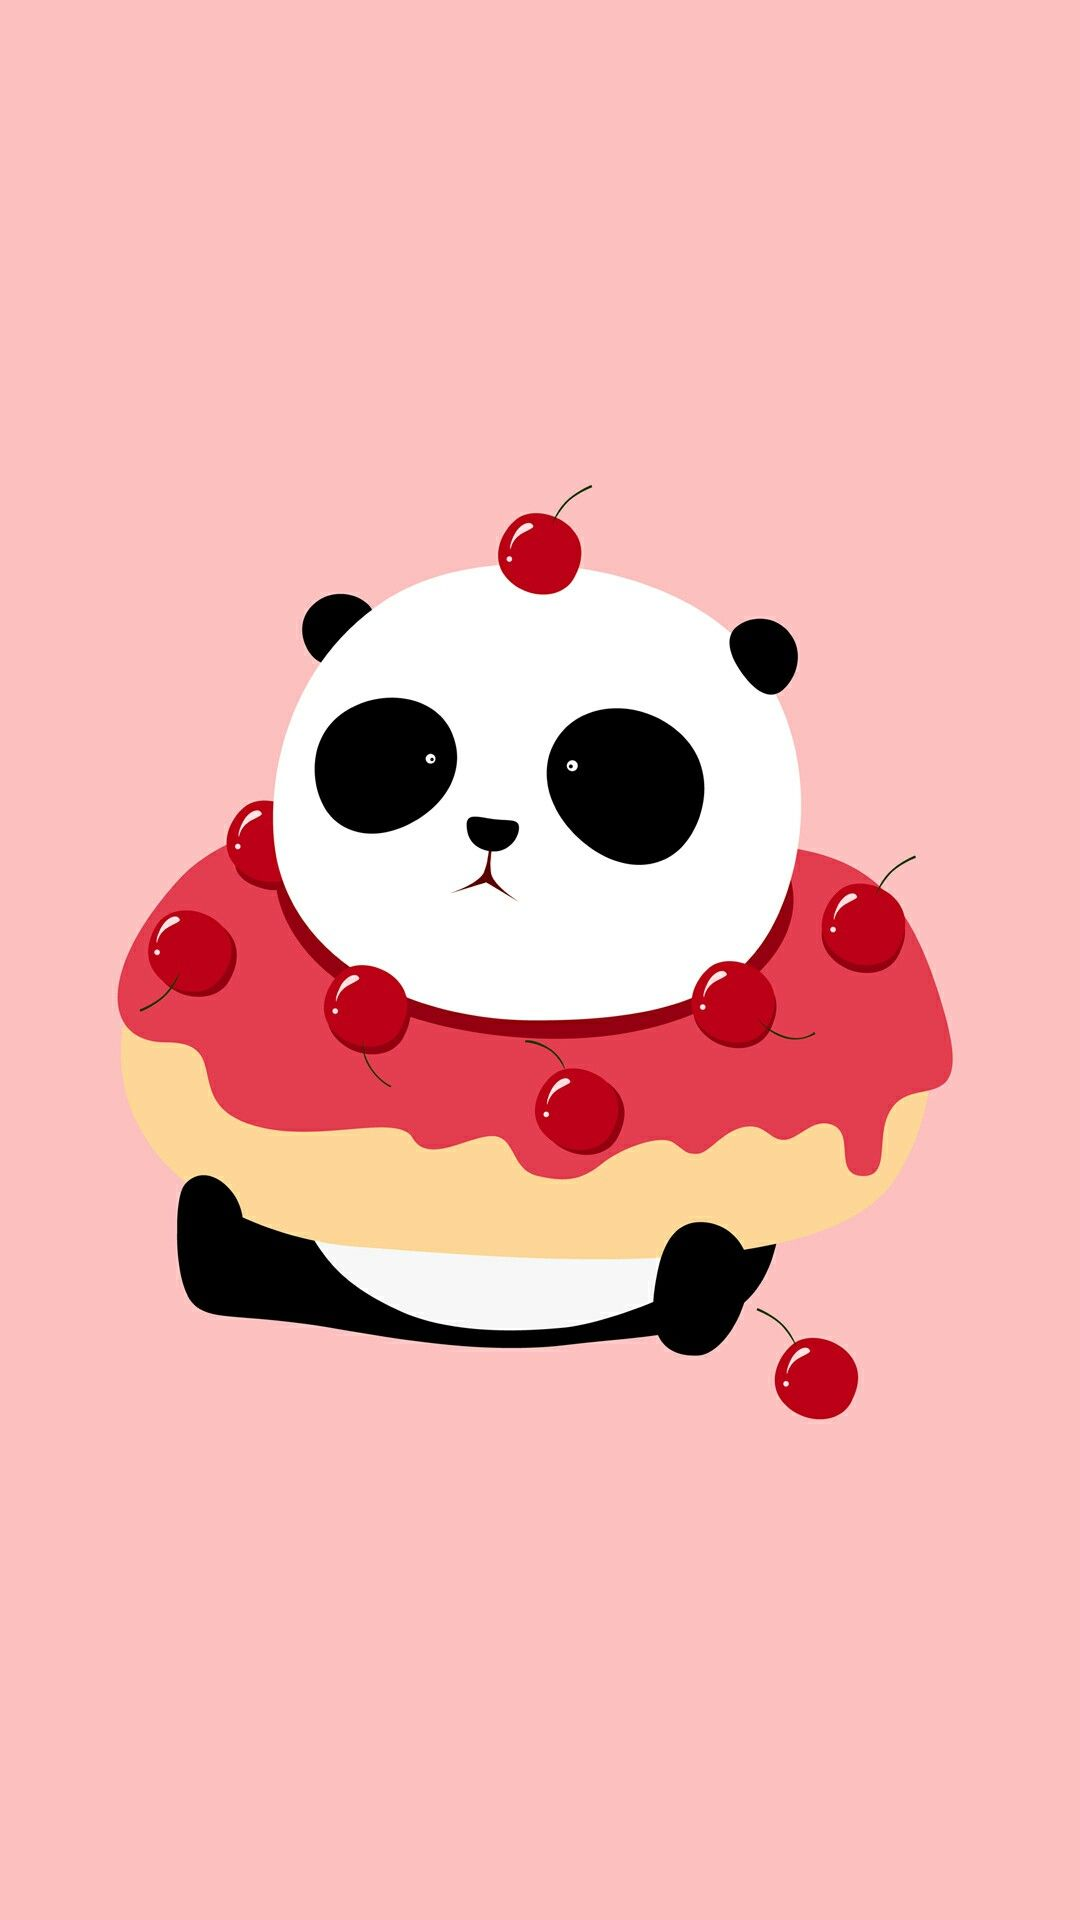 Kawaii Panda Wallpapers - Top Free Kawaii Panda ...